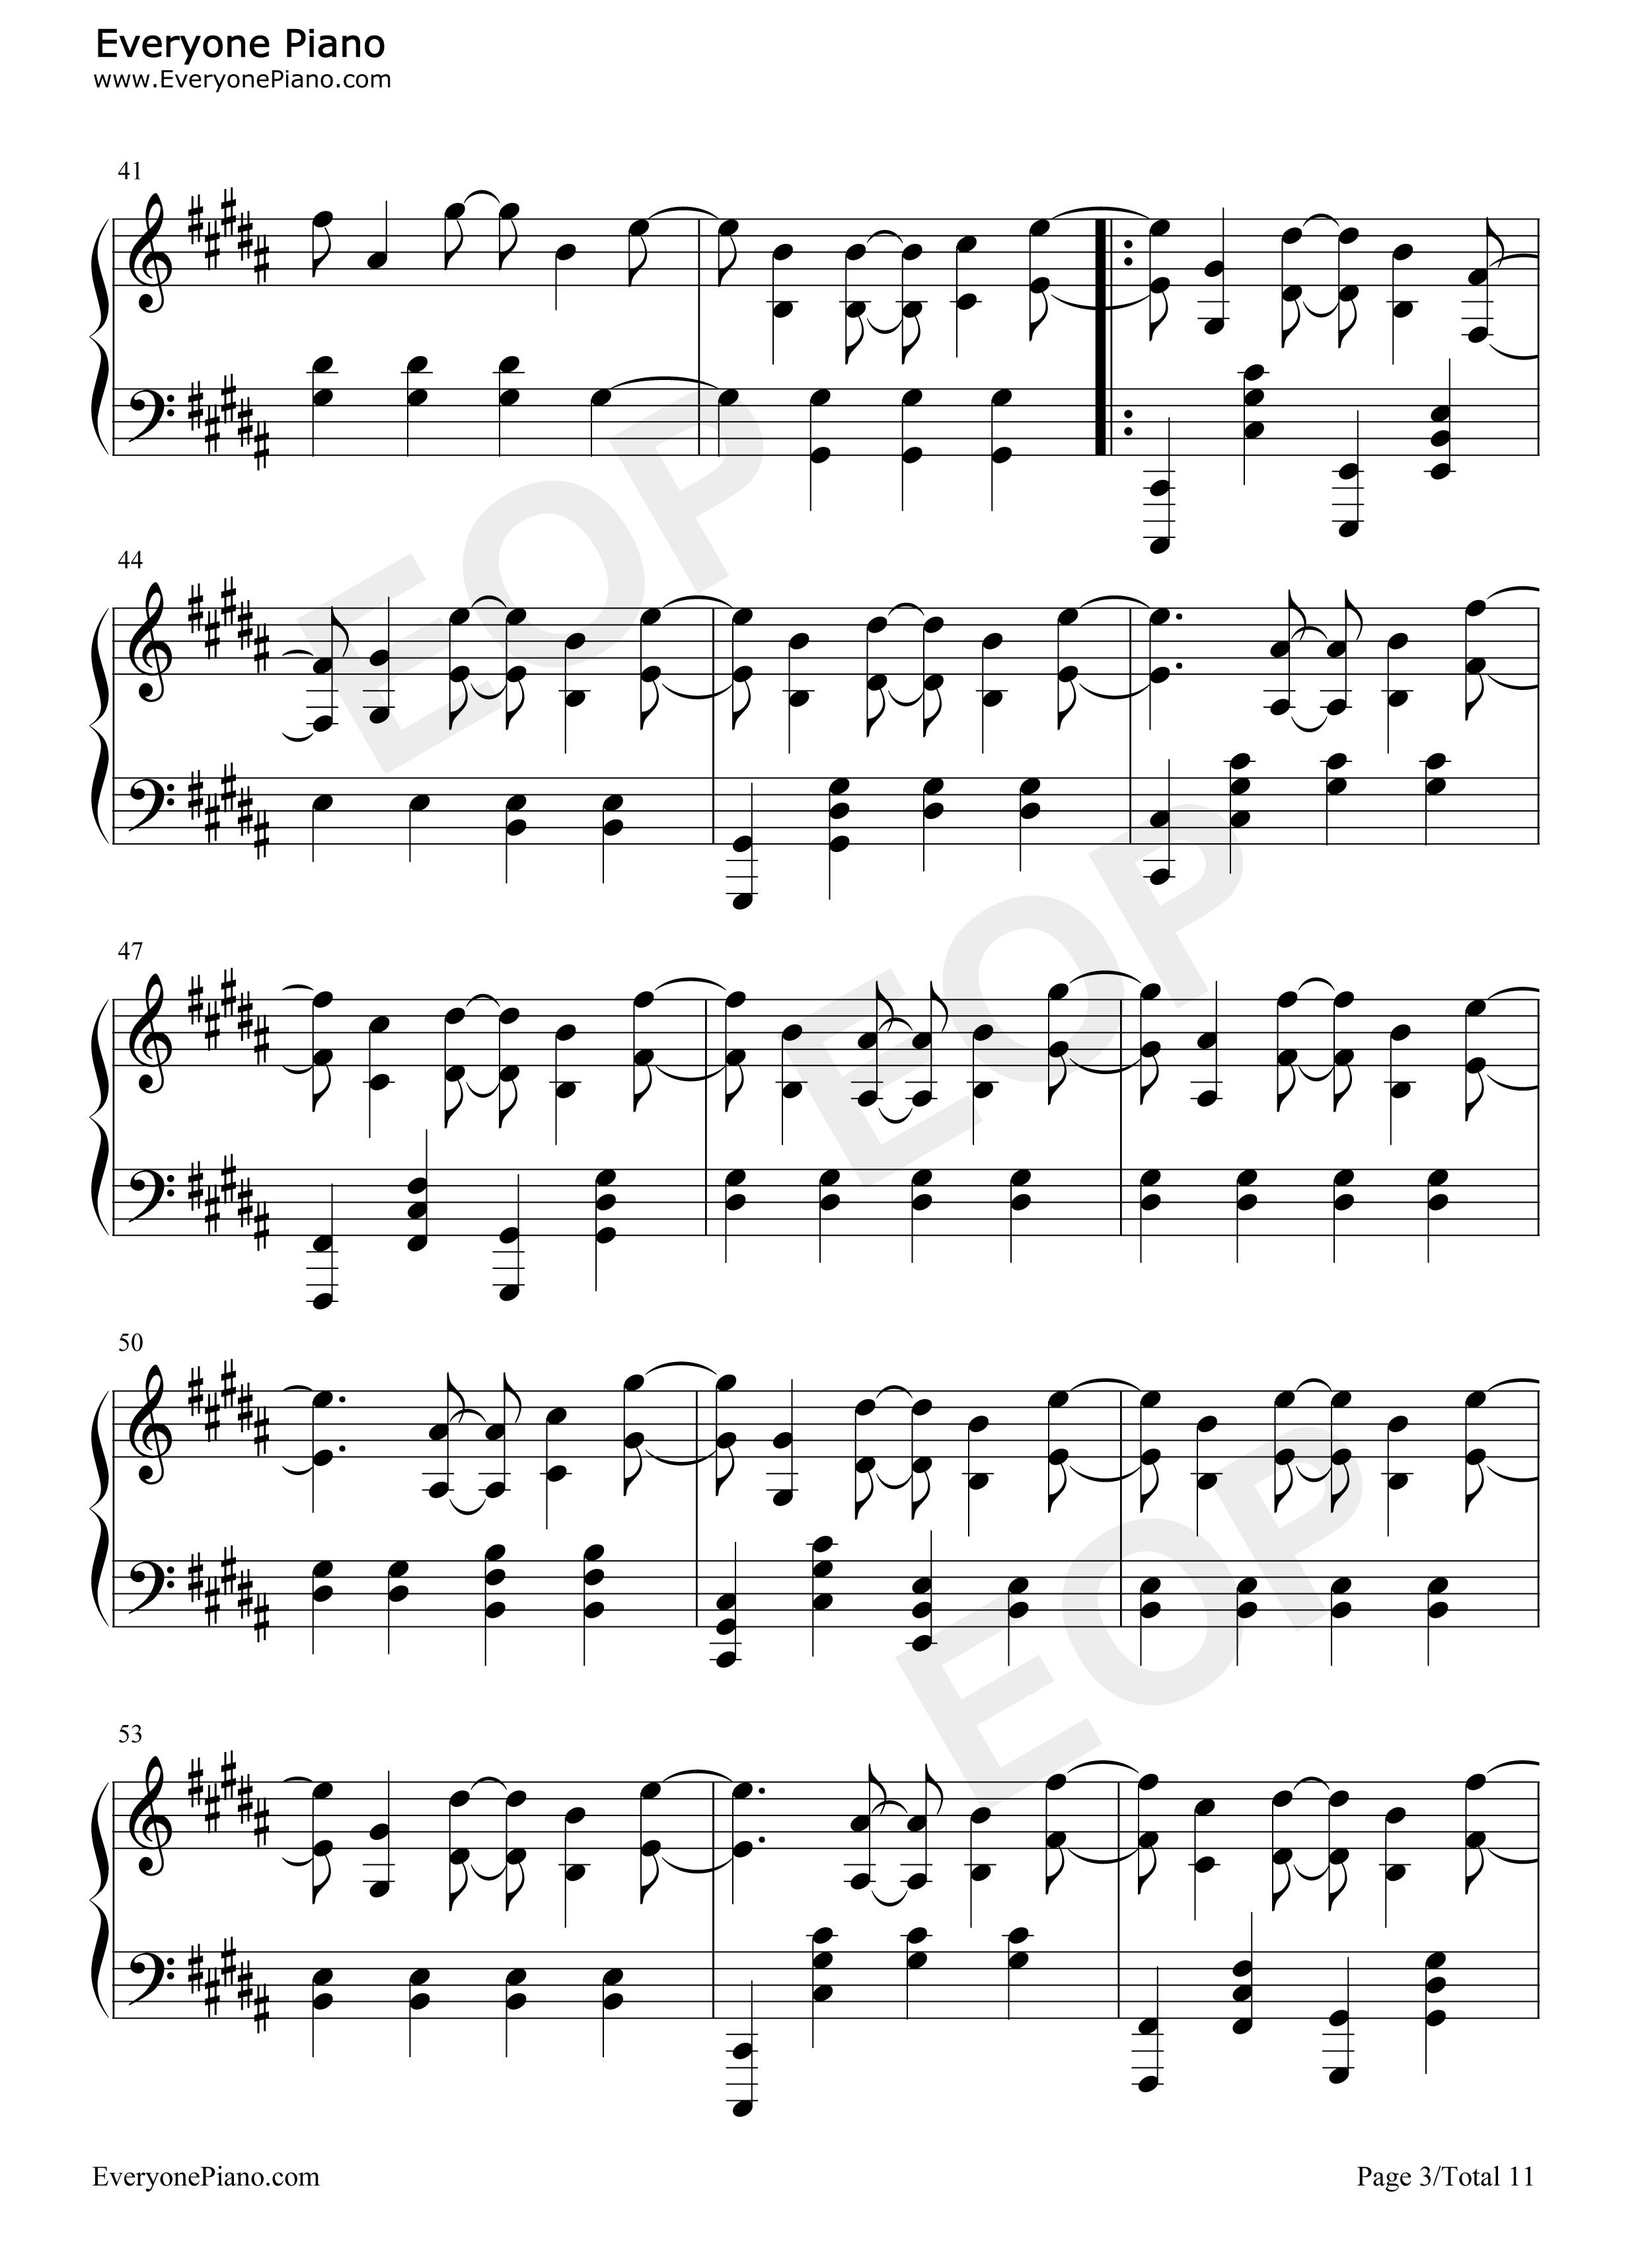 I remember deadmau5 sheet music.